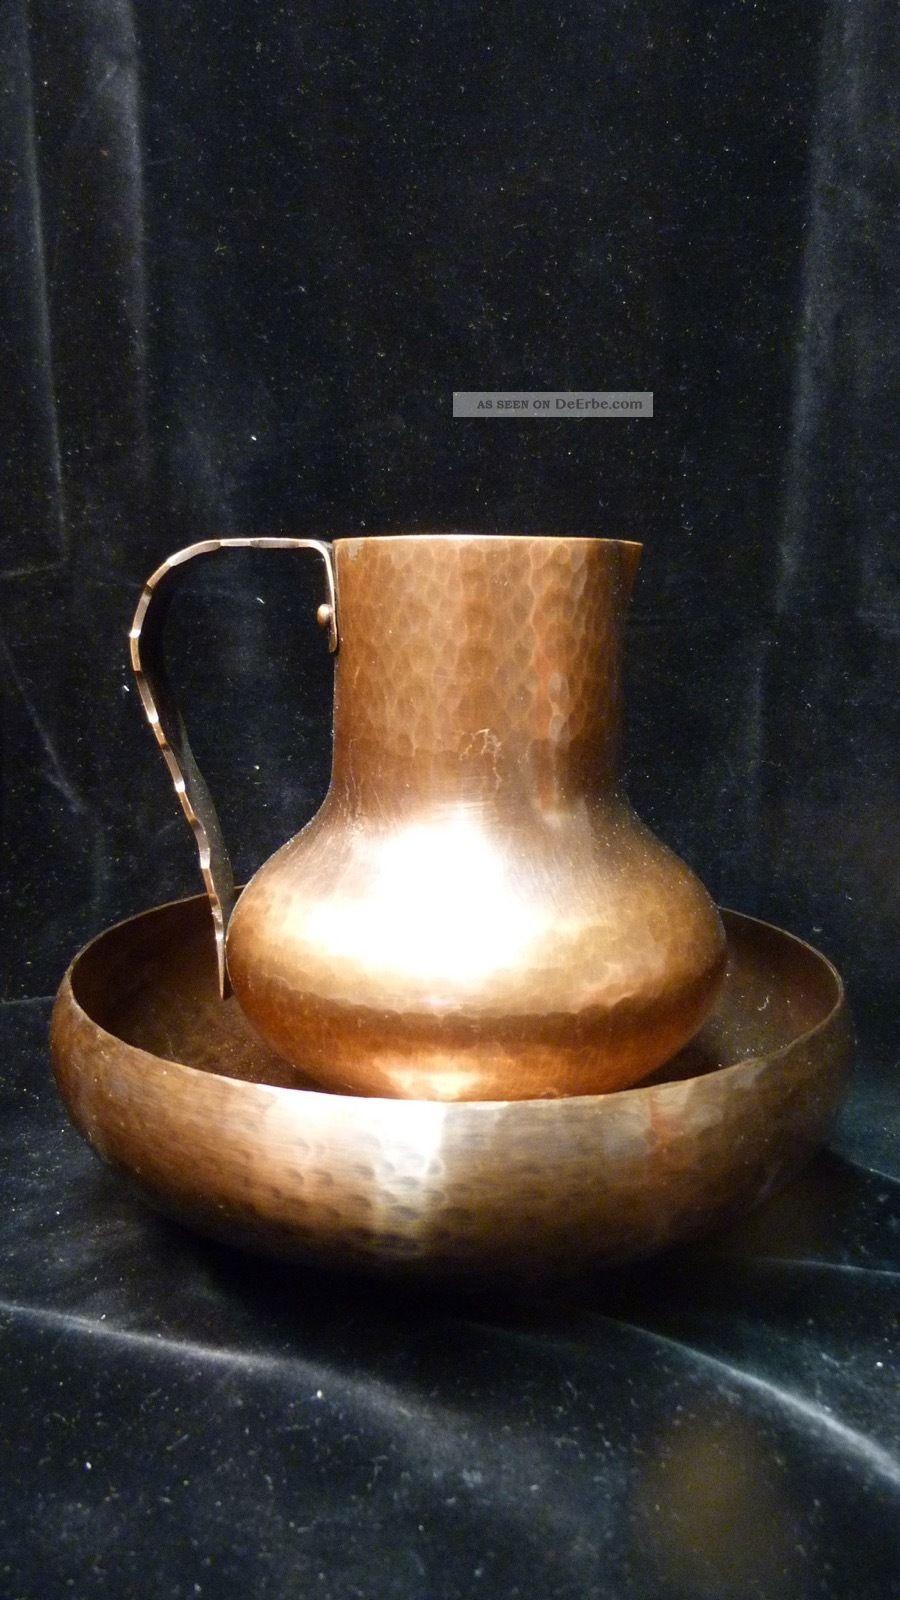 Alte Kupfer Krug & Schale - Handarbeit Von Richard Jakspeter - 50er J.  - Vintage Kupfer Bild